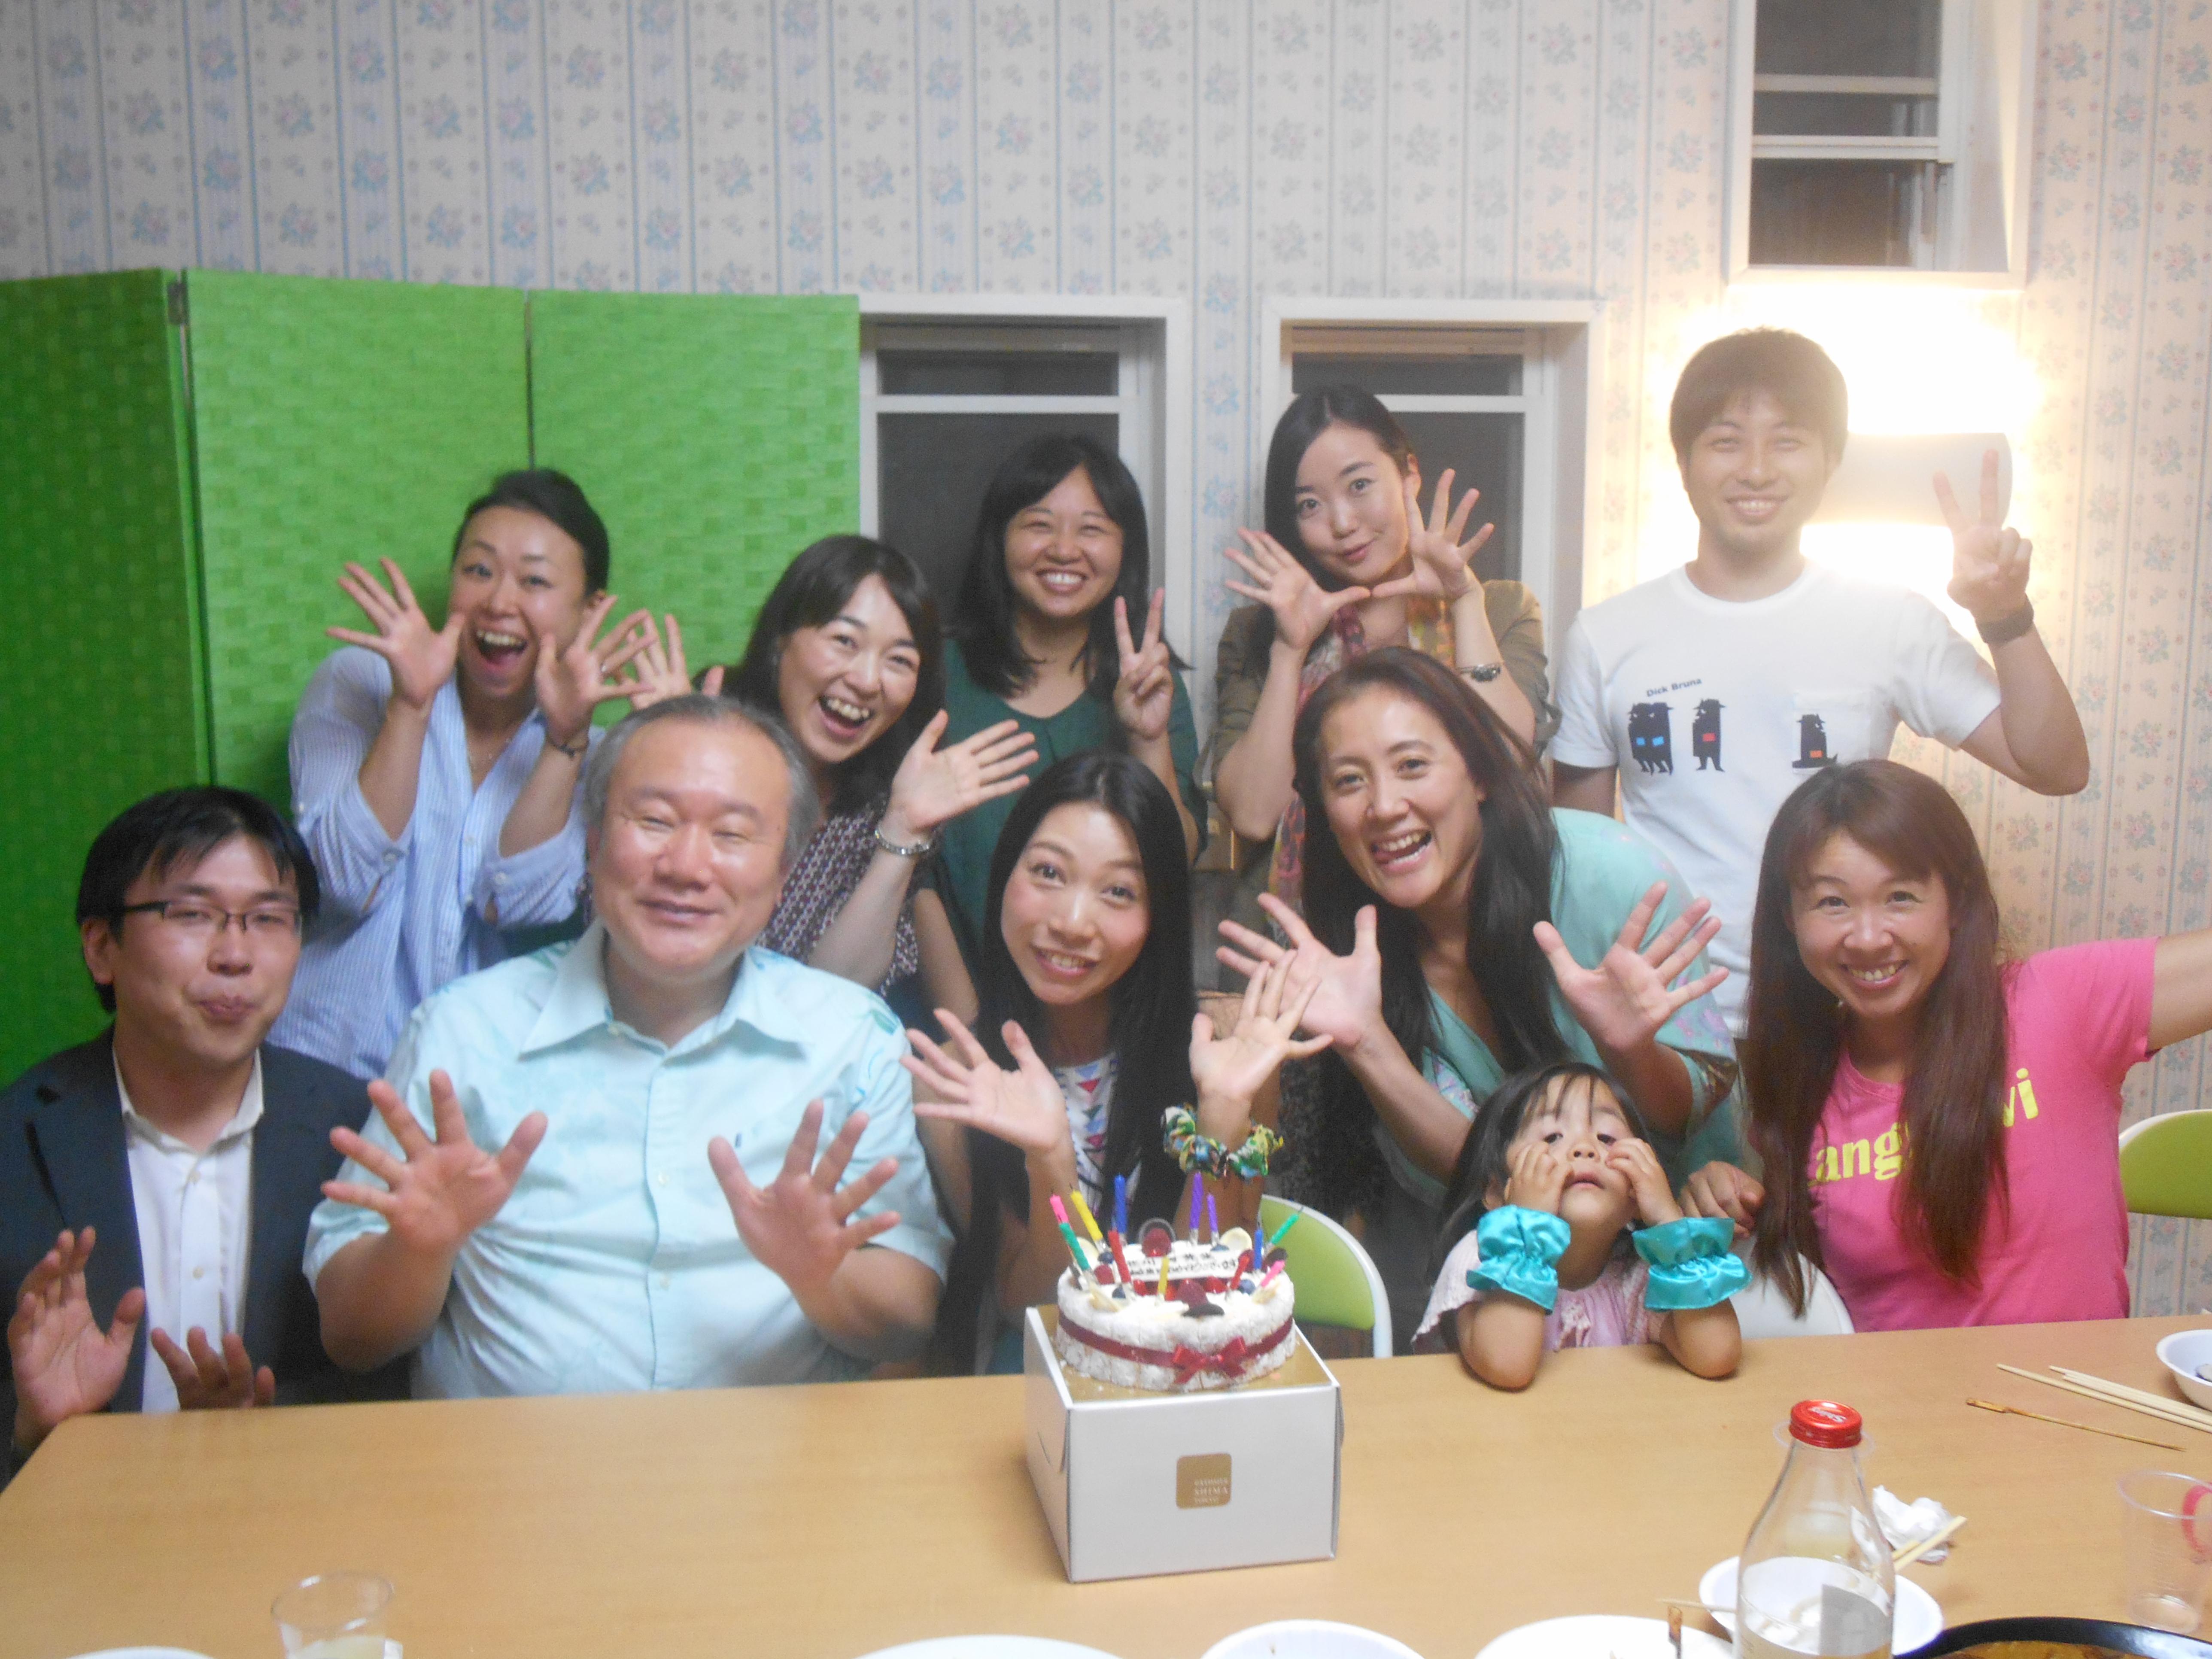 DSCN2041 - 池川明先生の愛の子育て塾第13期生(2018年8月~2018年12月)募集中です。